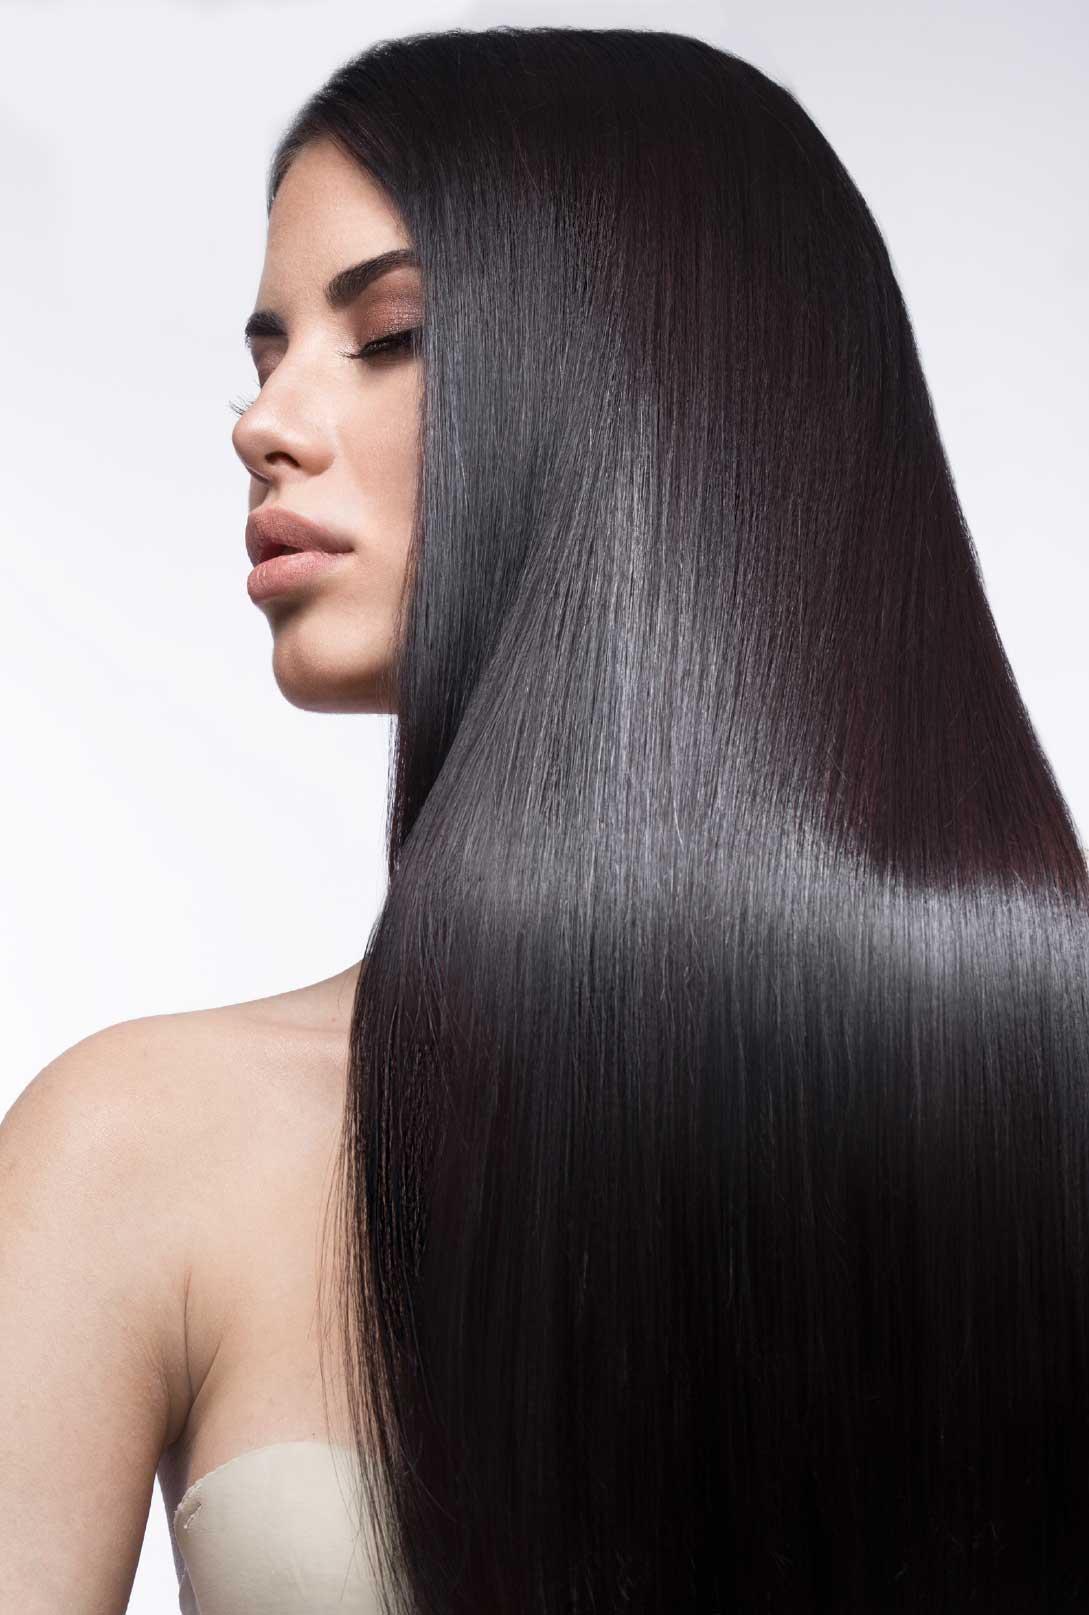 crna kosa nakon tretmana kosta hair proizvodima